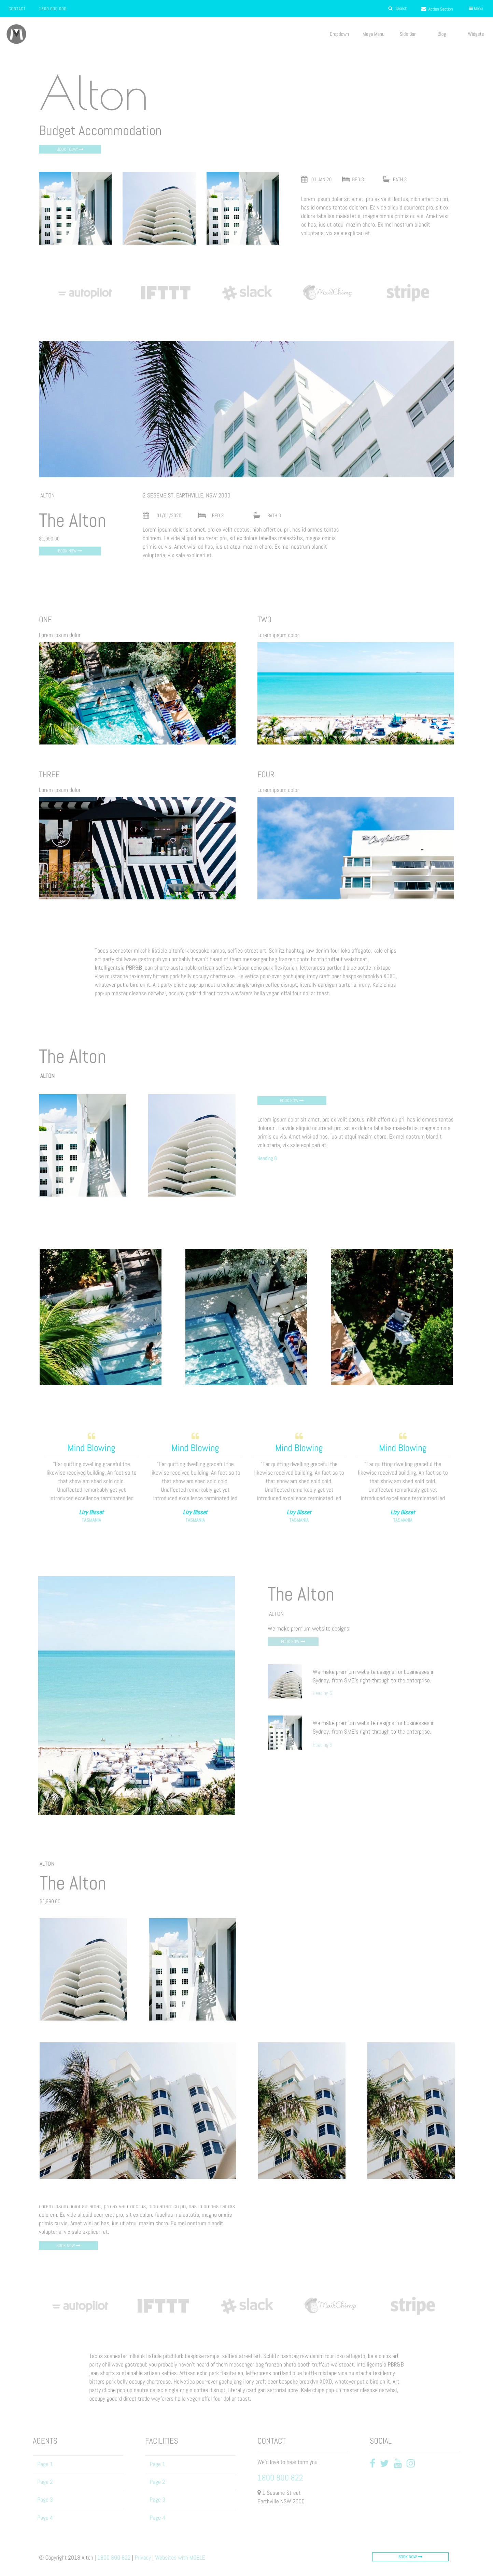 Alton Website Template Home